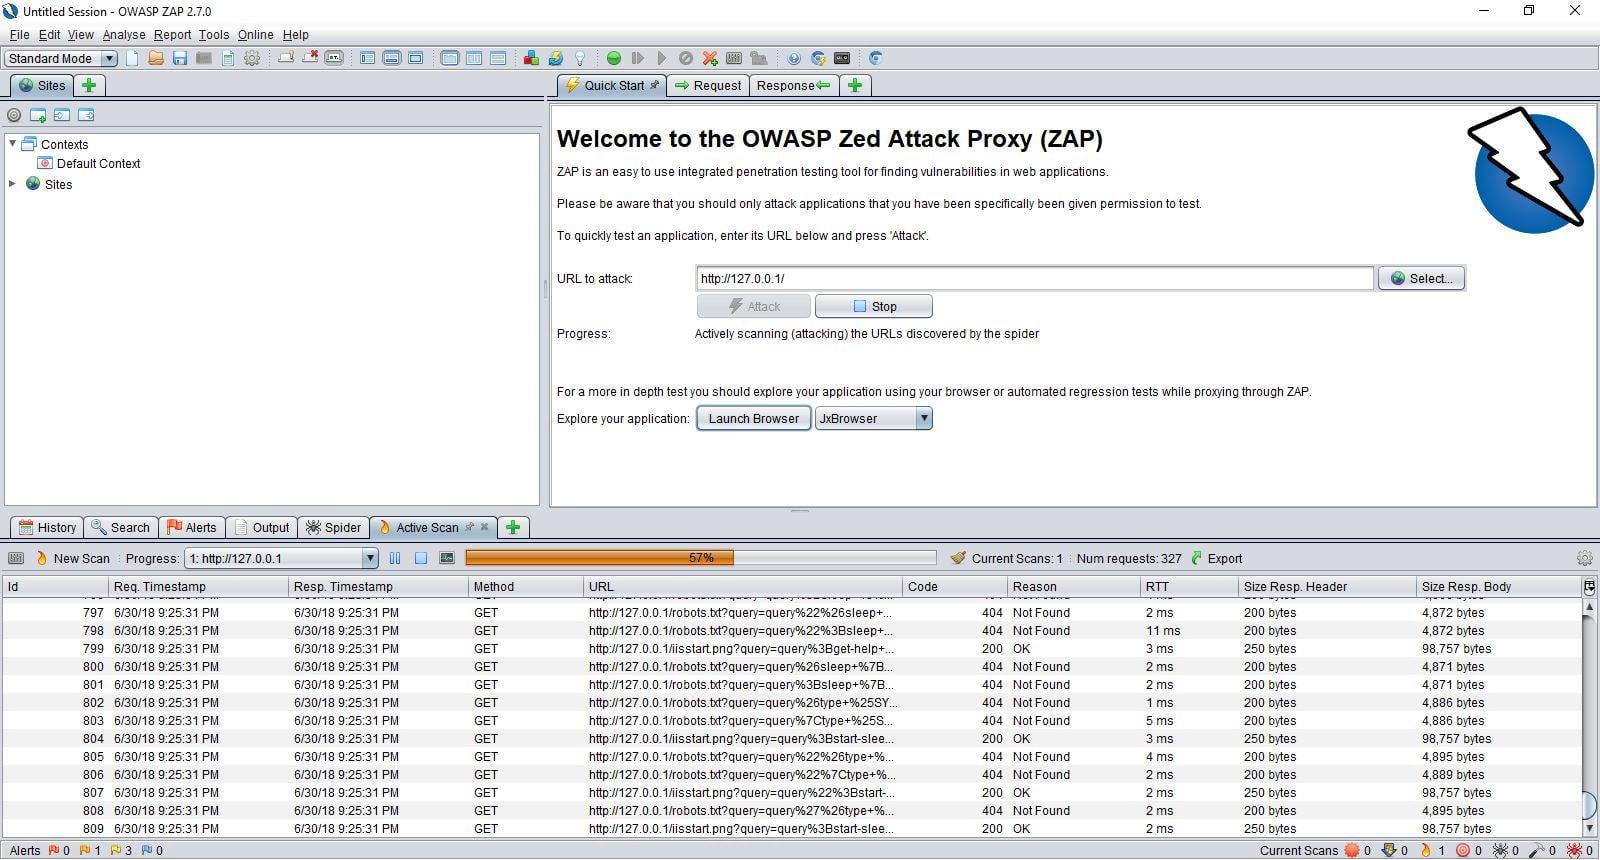 OWASP Zap Screenshot